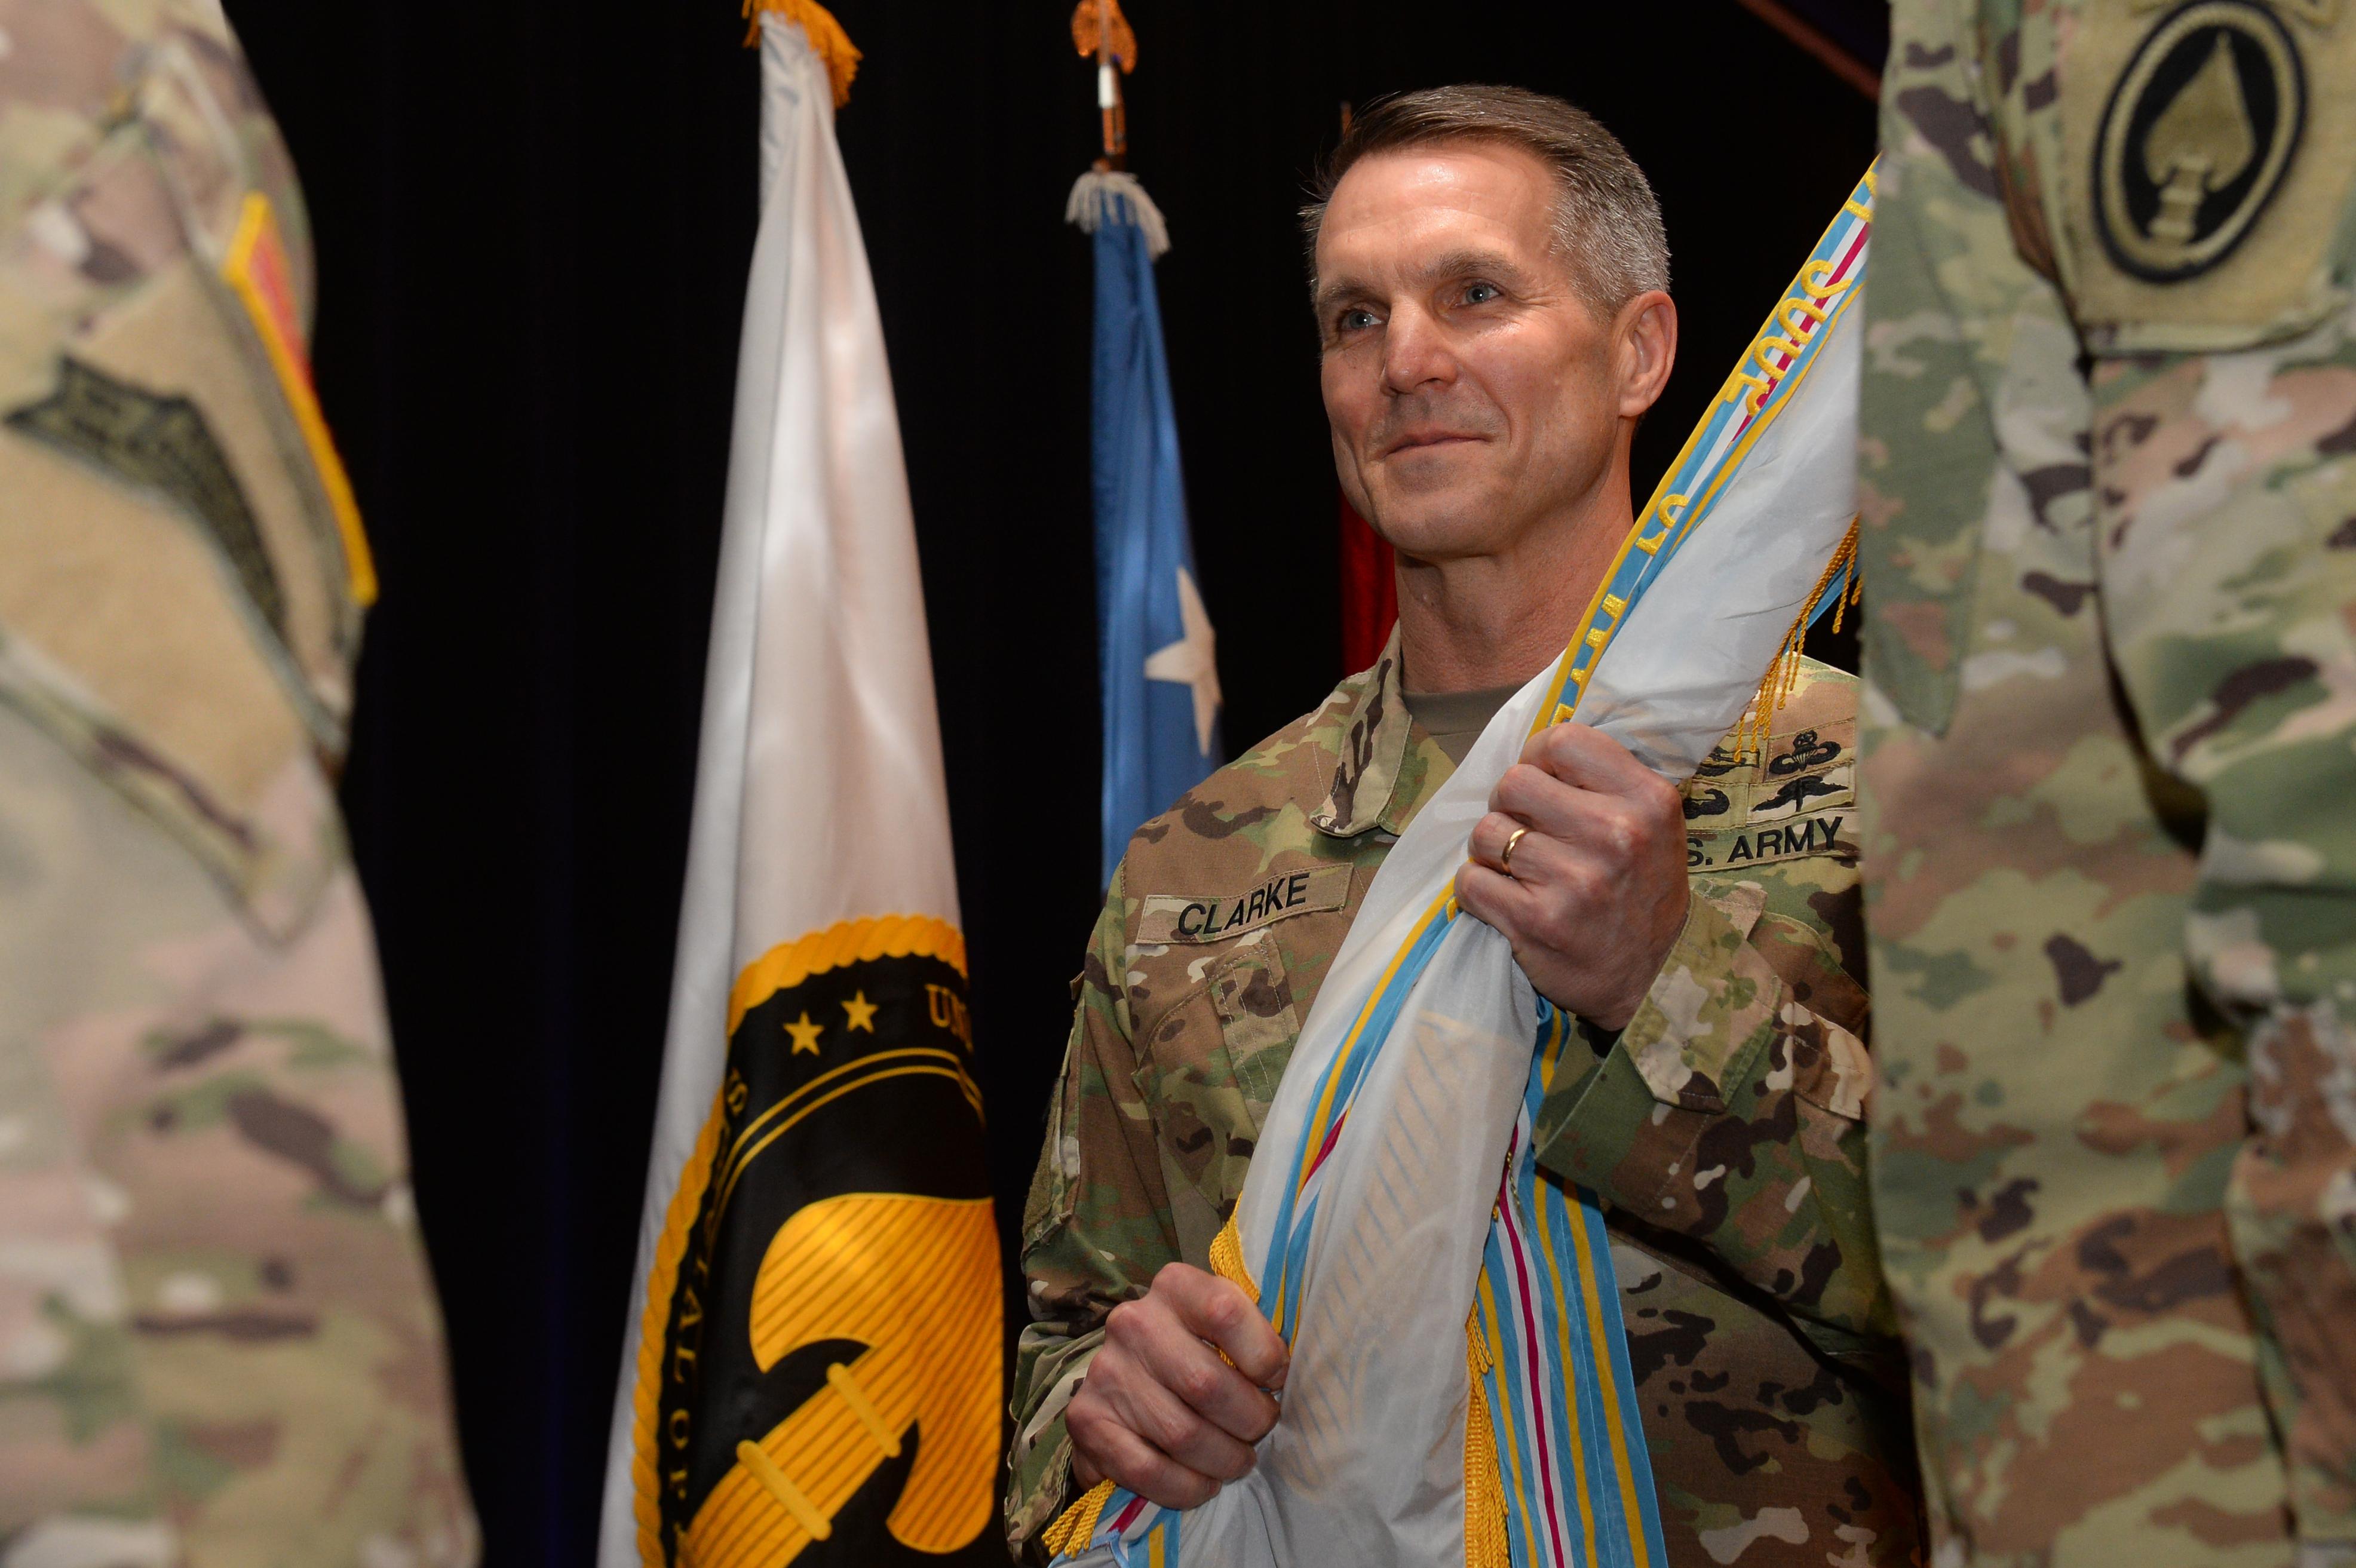 Amry Master Sgt. George Vera